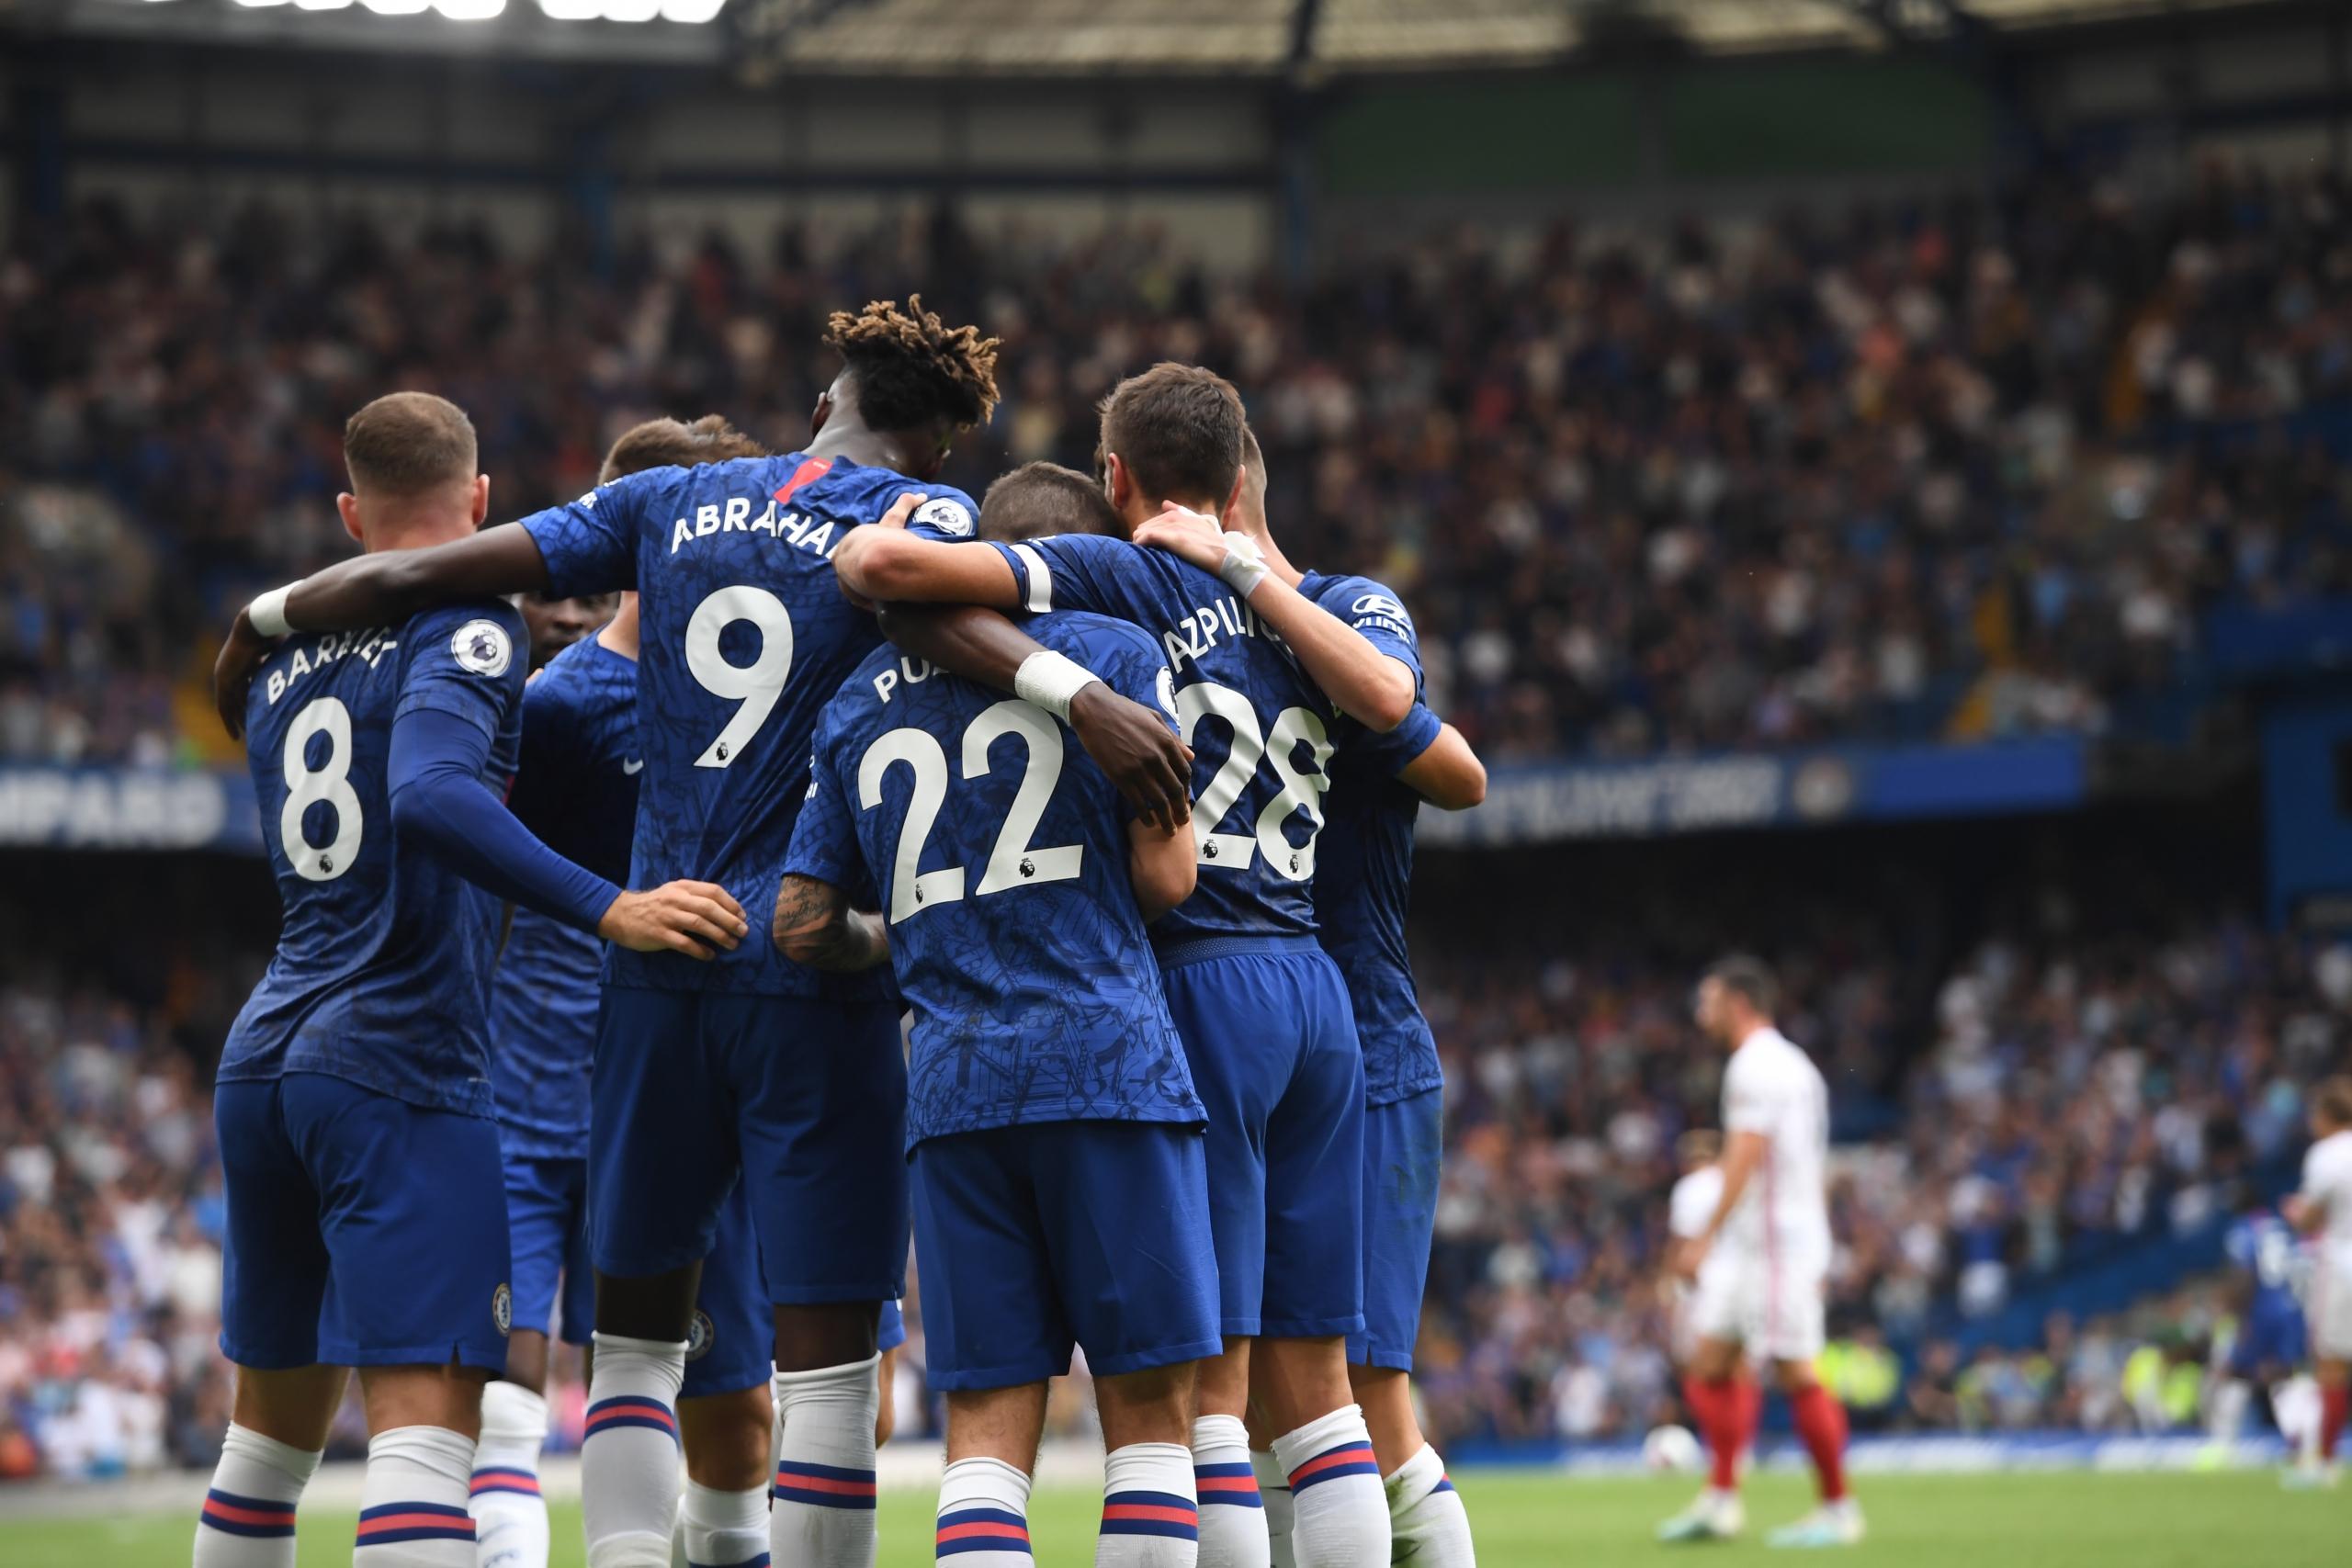 Chelsea v Southampton Thurs 26th Dec 2019 or Burnley Sat 11th Jan 2020